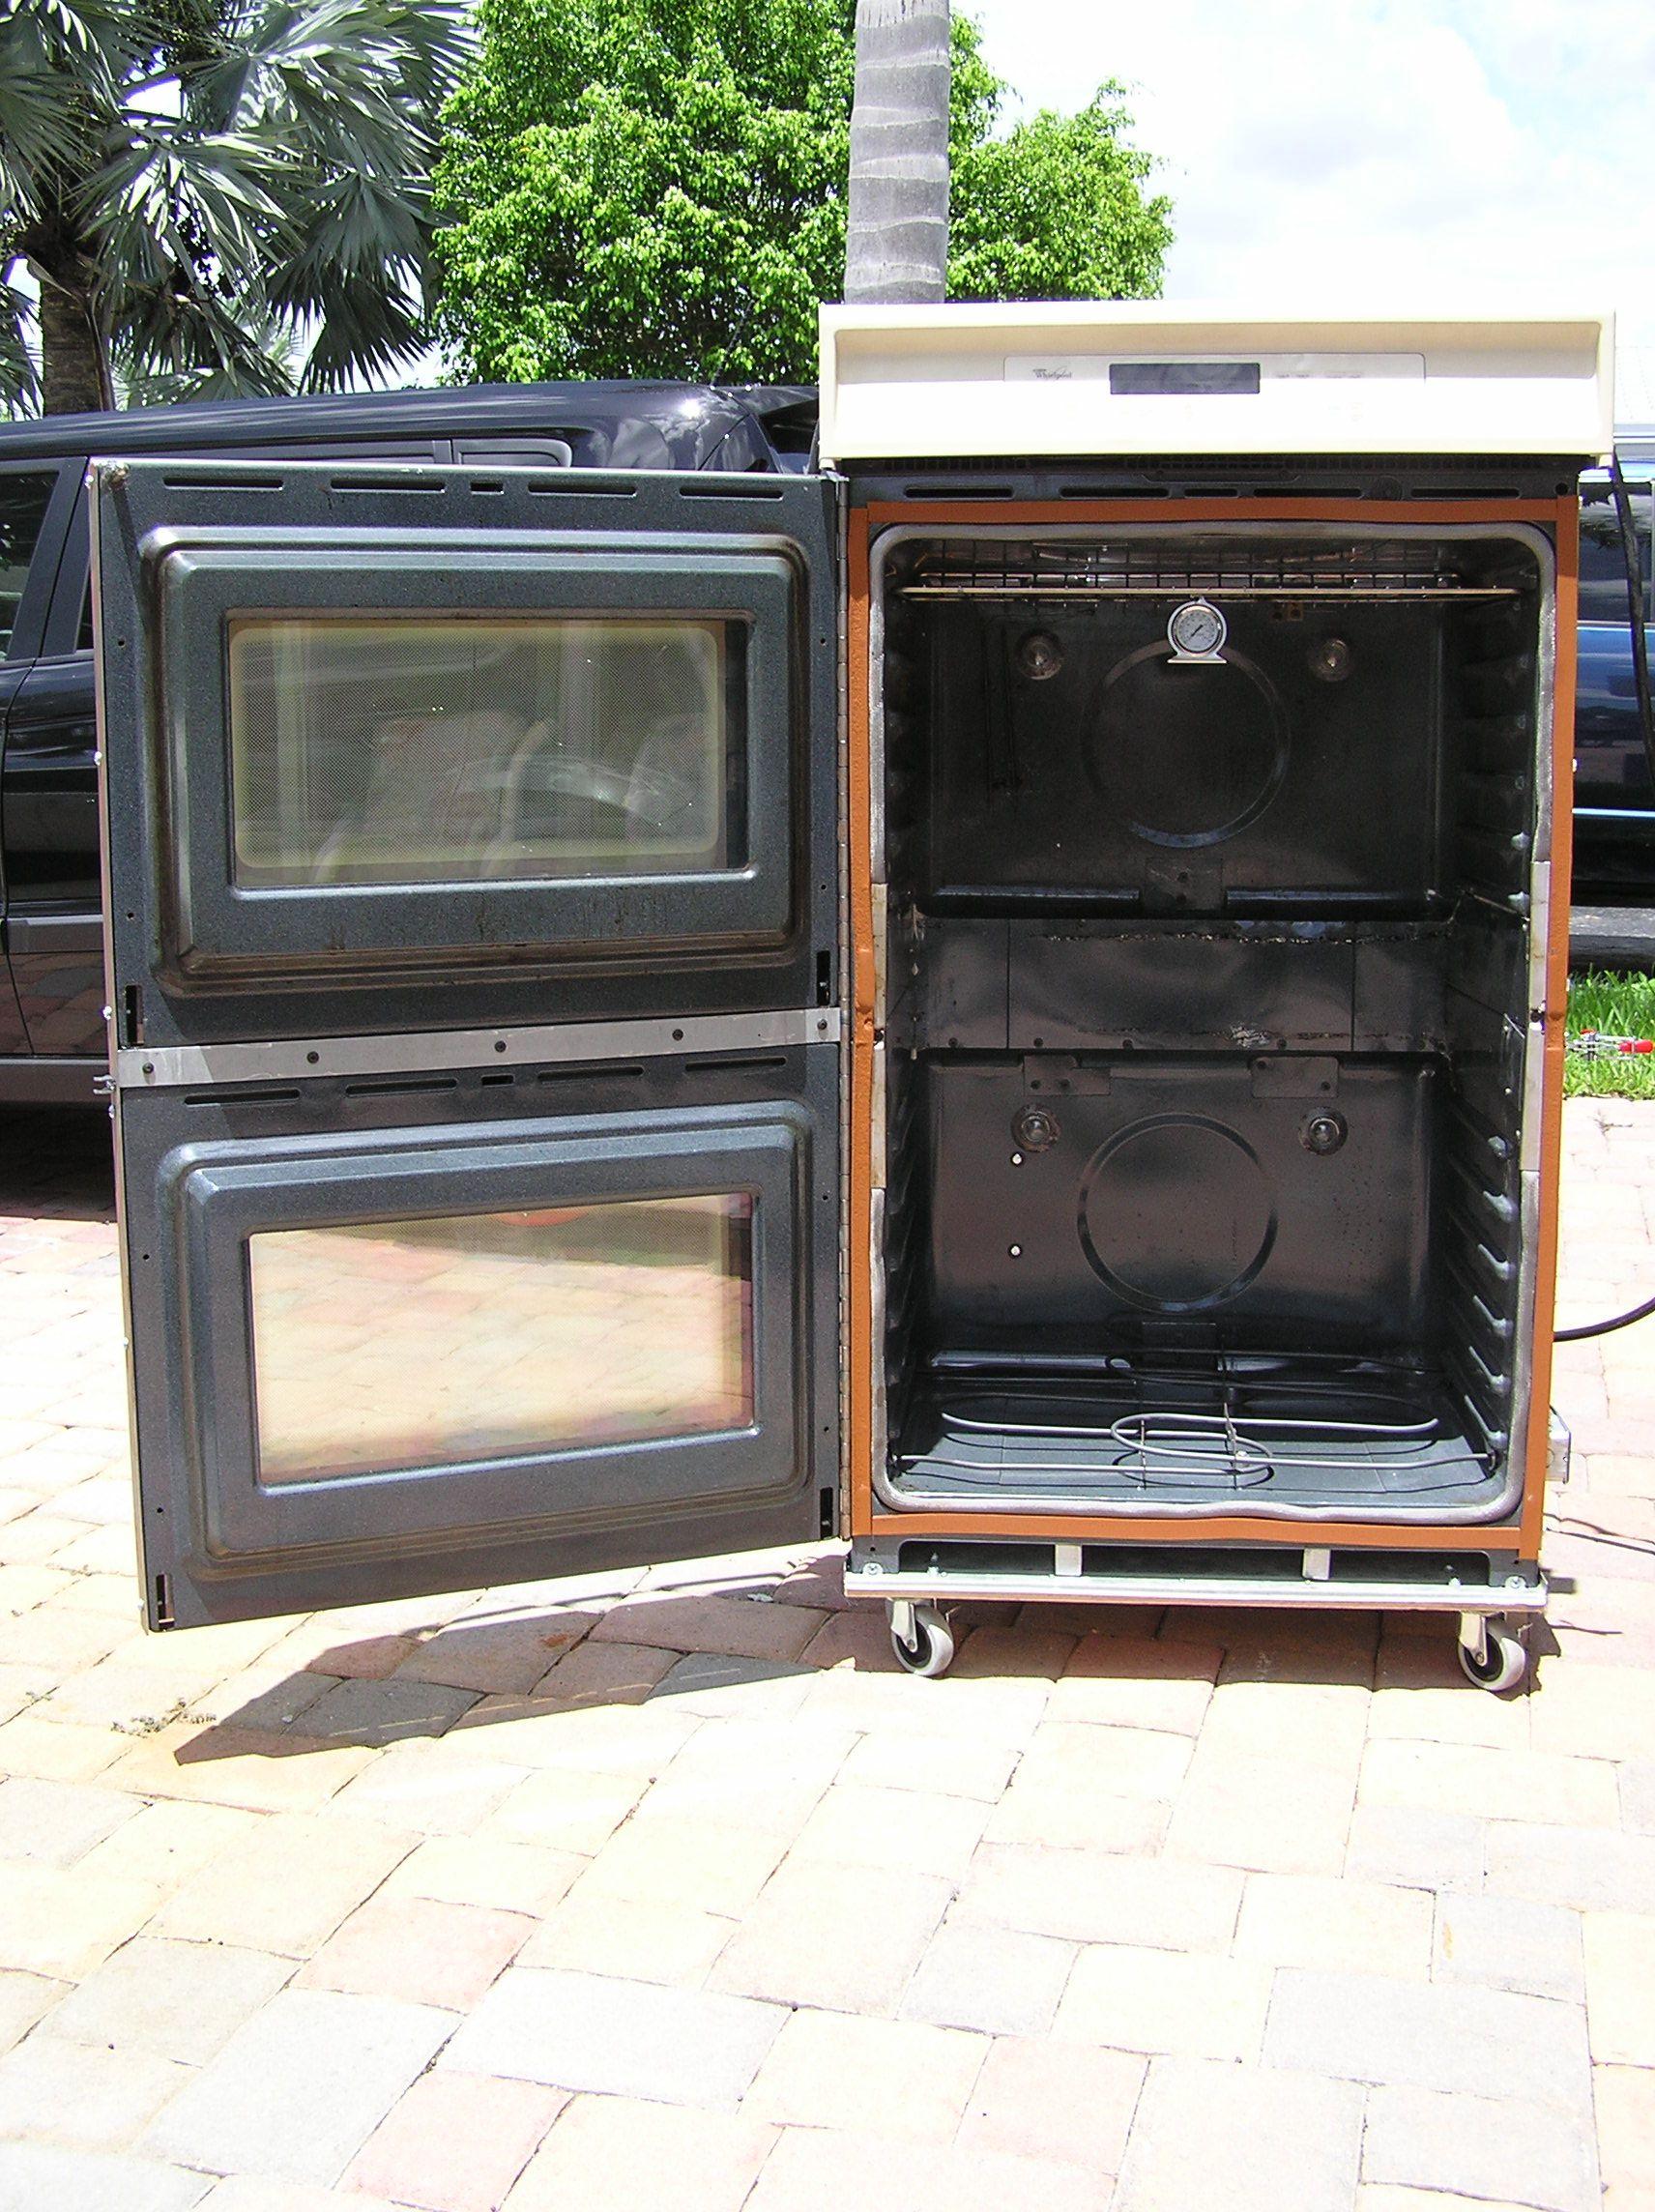 Diy powder coat oven powder coating oven powder coating